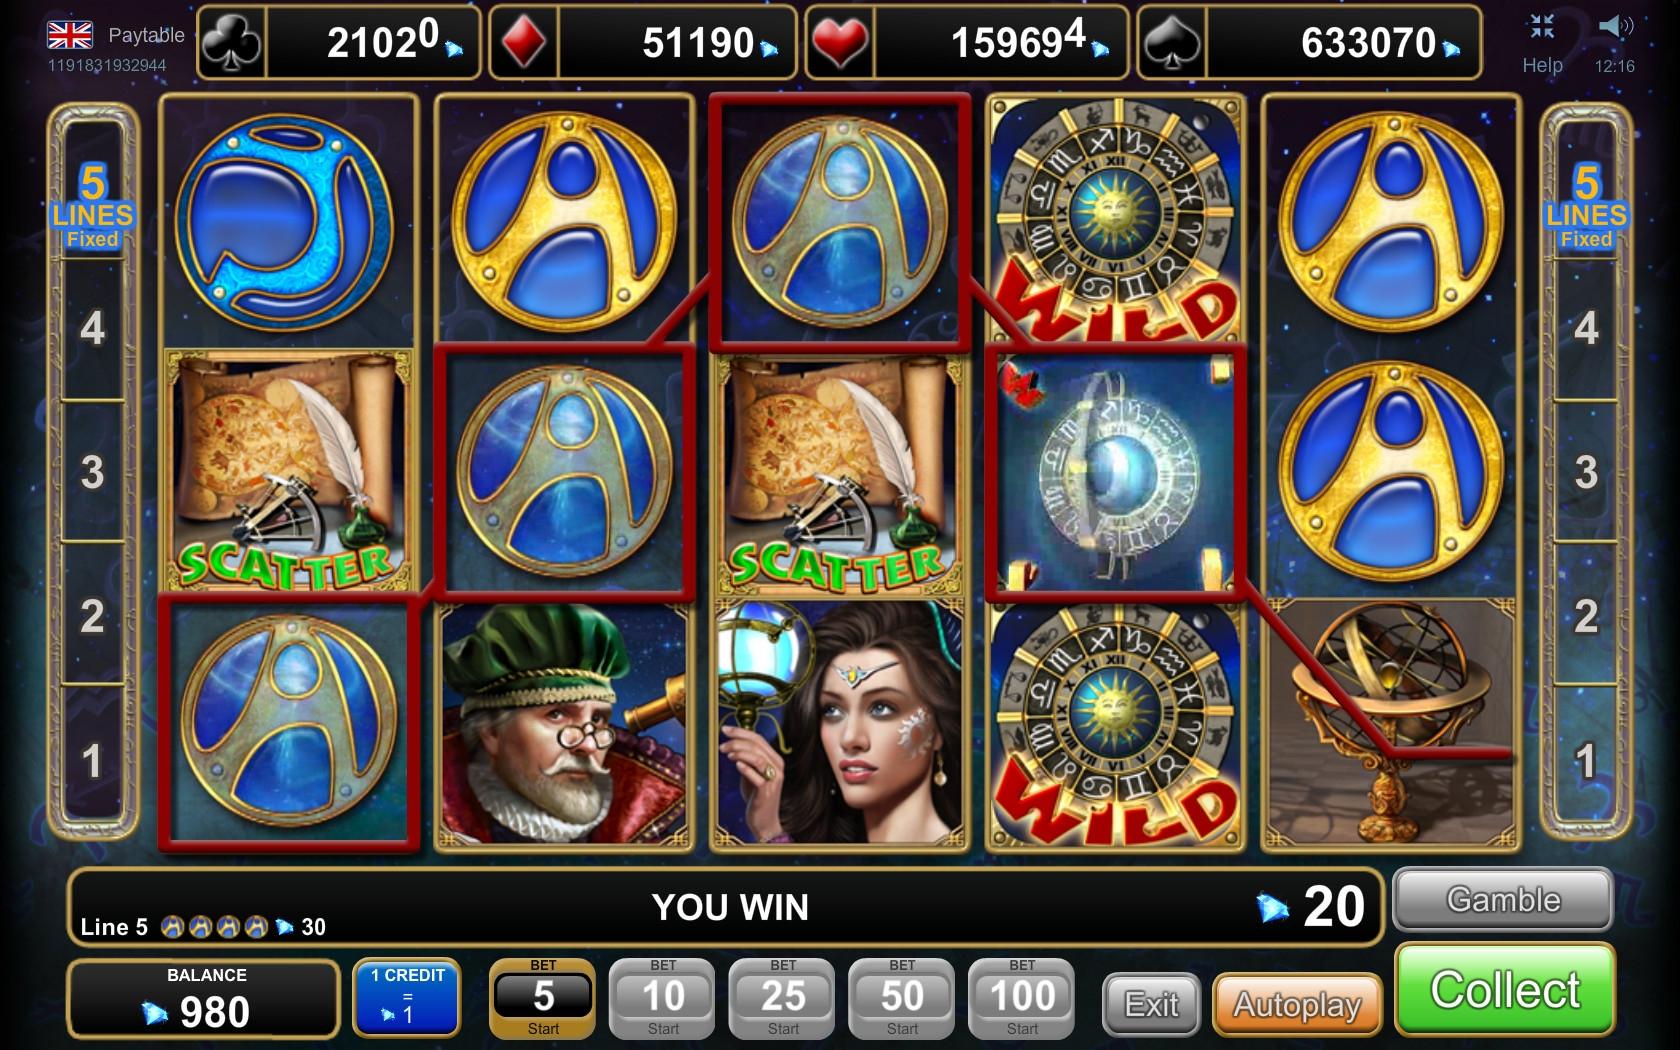 Volcanic Cash Slot Beschreibung & Casino-Spiel gratis spielen